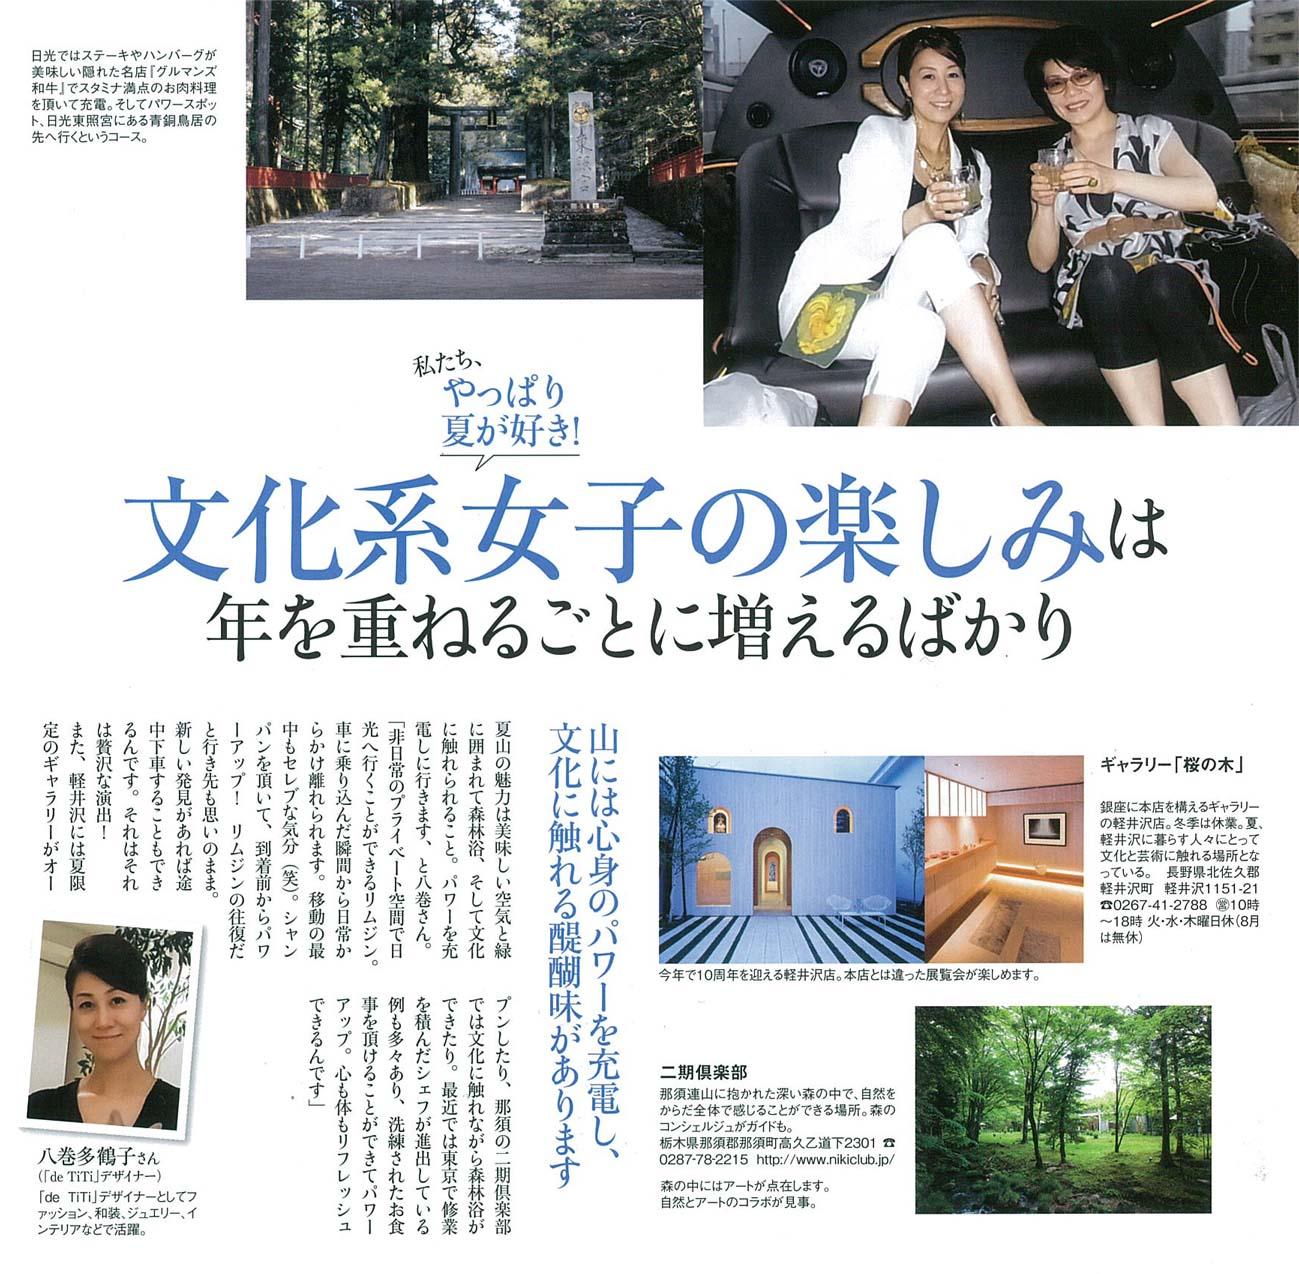 HERS8月号「都心の隠れ家」、「メーク嫌いさんのオシャレ顔テクニック」_a0138976_20503577.jpg